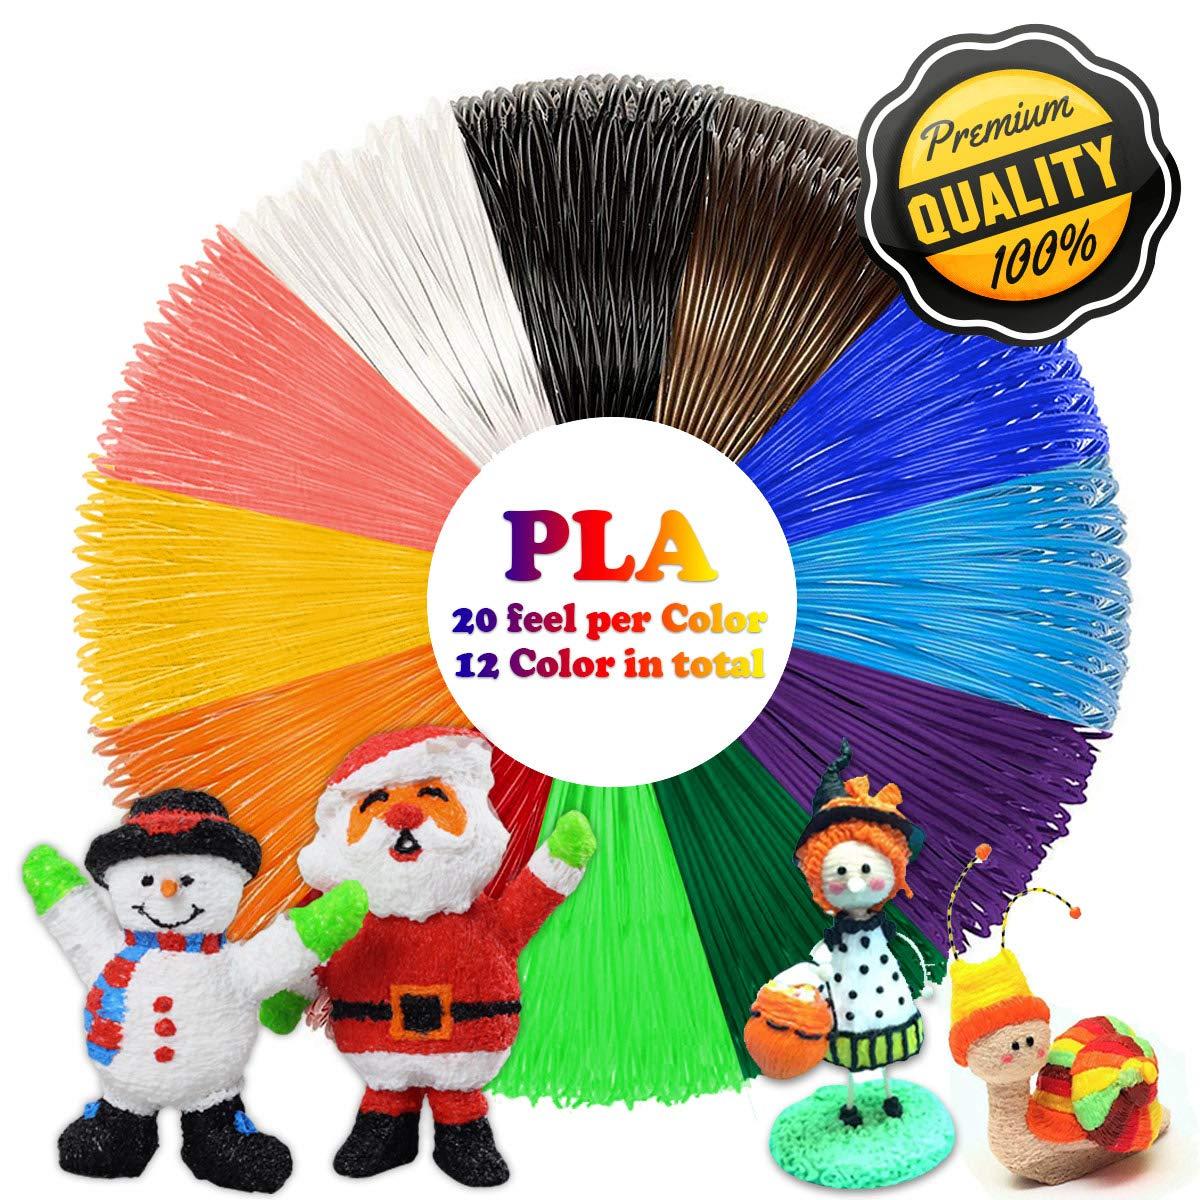 PLA 3D Pen Filament Refills(12 Colors, 20 Feet Each) with 100 Stencils EBooks 3D Printing Pen Filament 1.75mm Total 240 Feet dikale OD3DLINE-DK-12PLA06